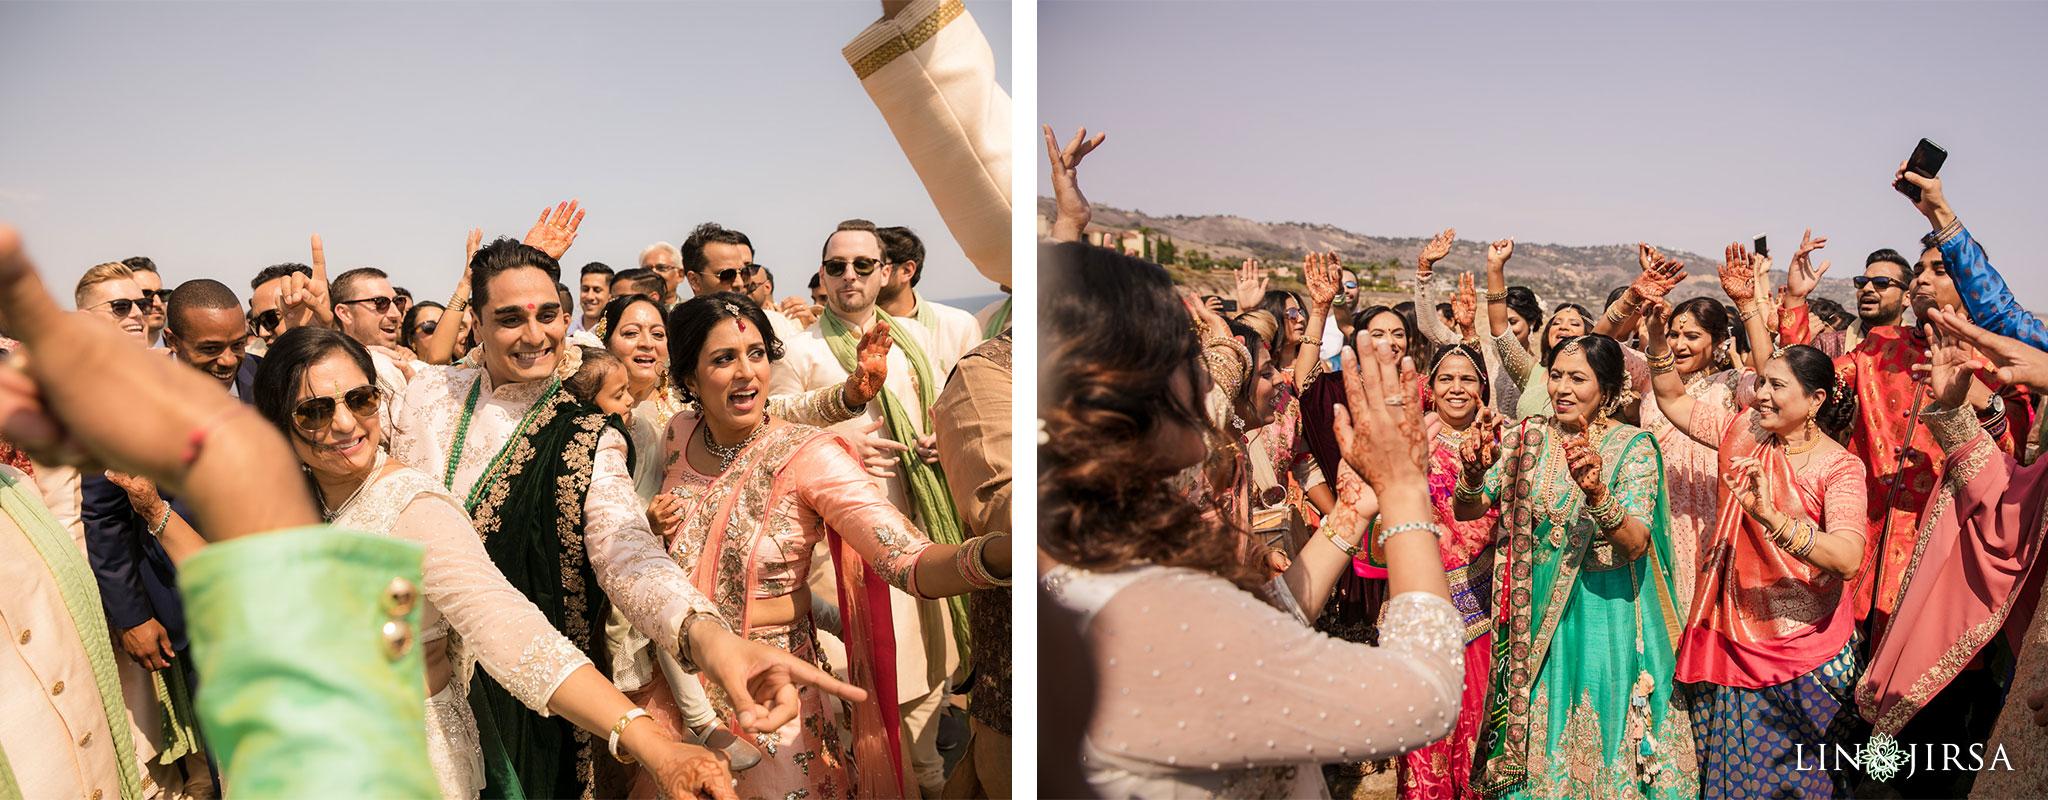 026 terranea resort palos verdes indian baraat wedding photography